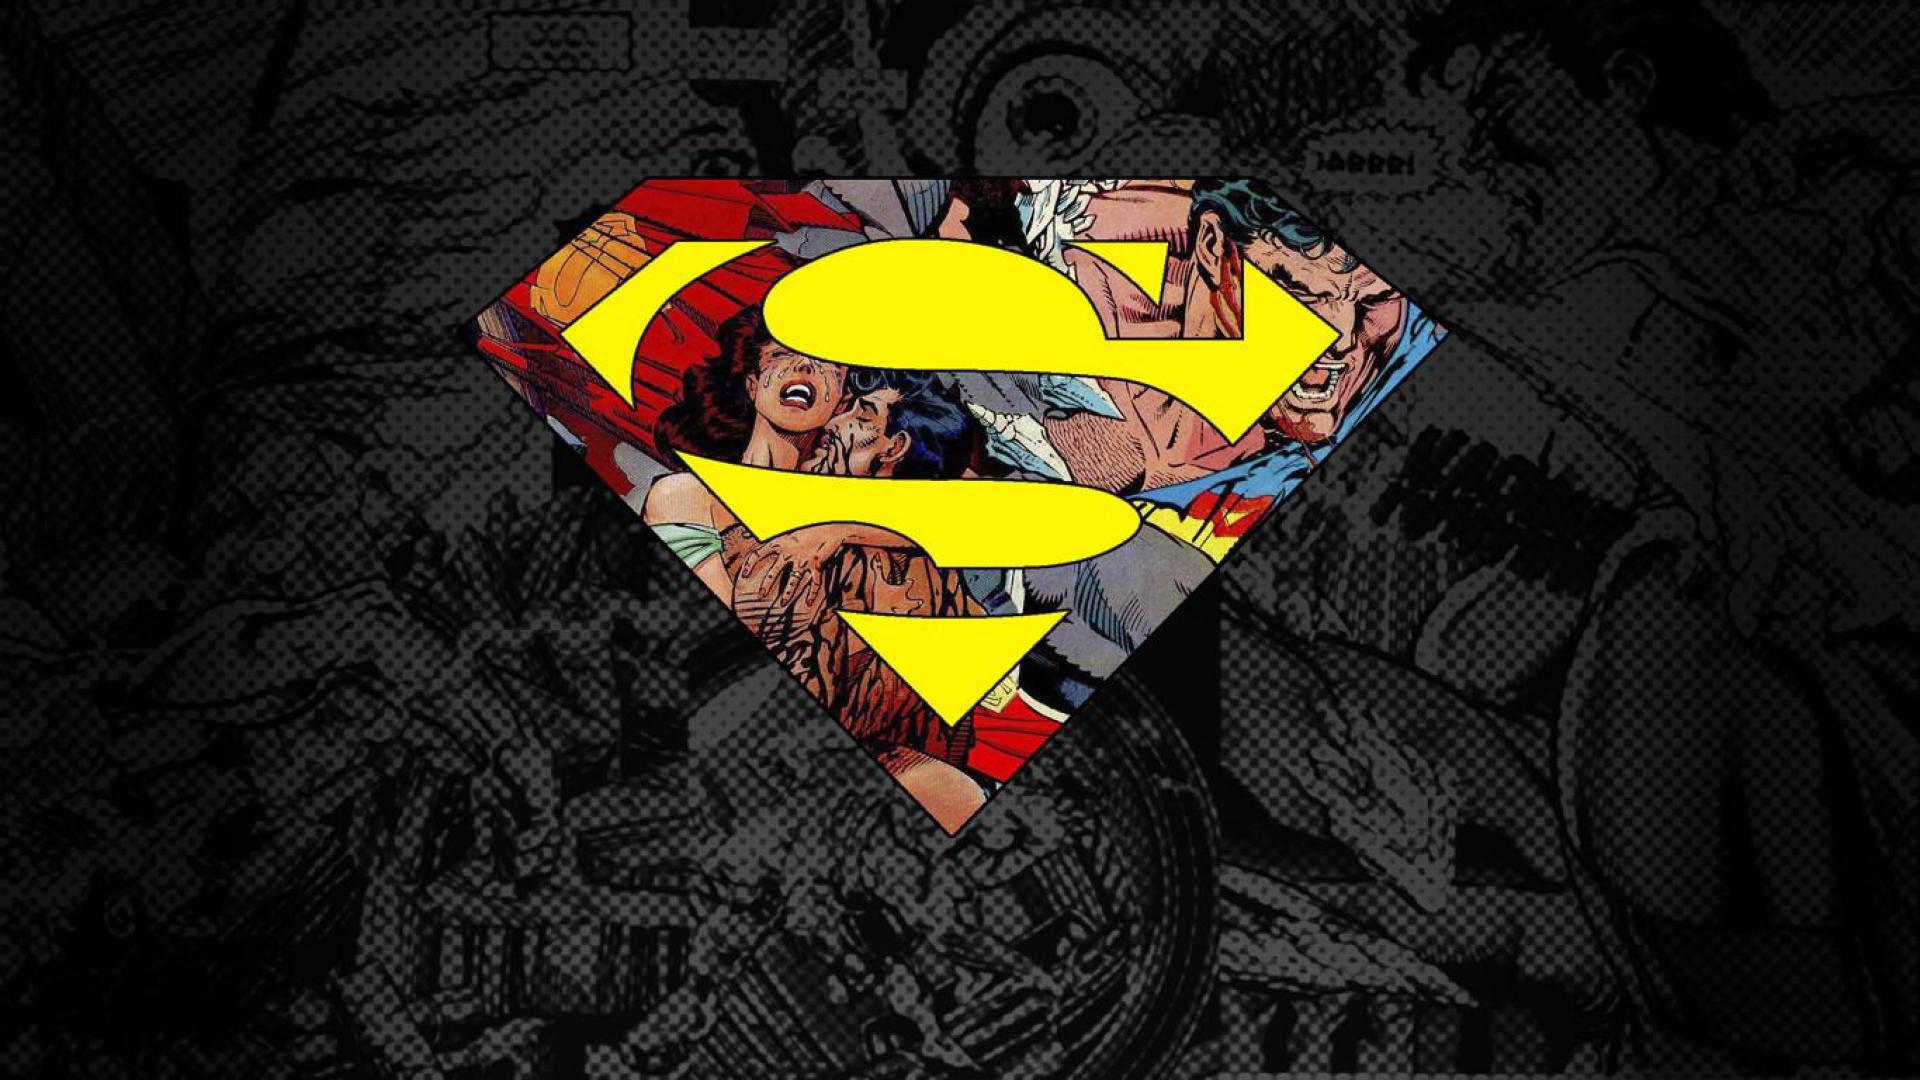 Superman logo hd wallpapers 1080p 60 images 1920x1080 hd pics photos abstract superman logo hd hd quality desktop background wallpaper voltagebd Choice Image